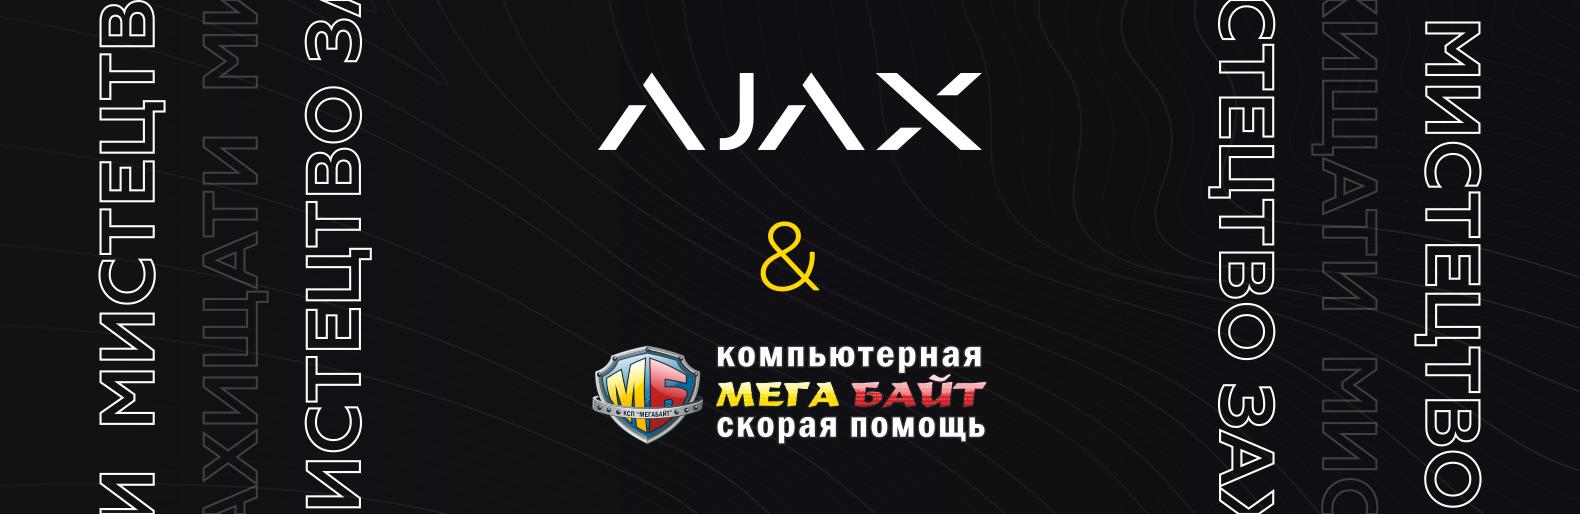 "Системи безпеки ""Ajax"", фото-1"